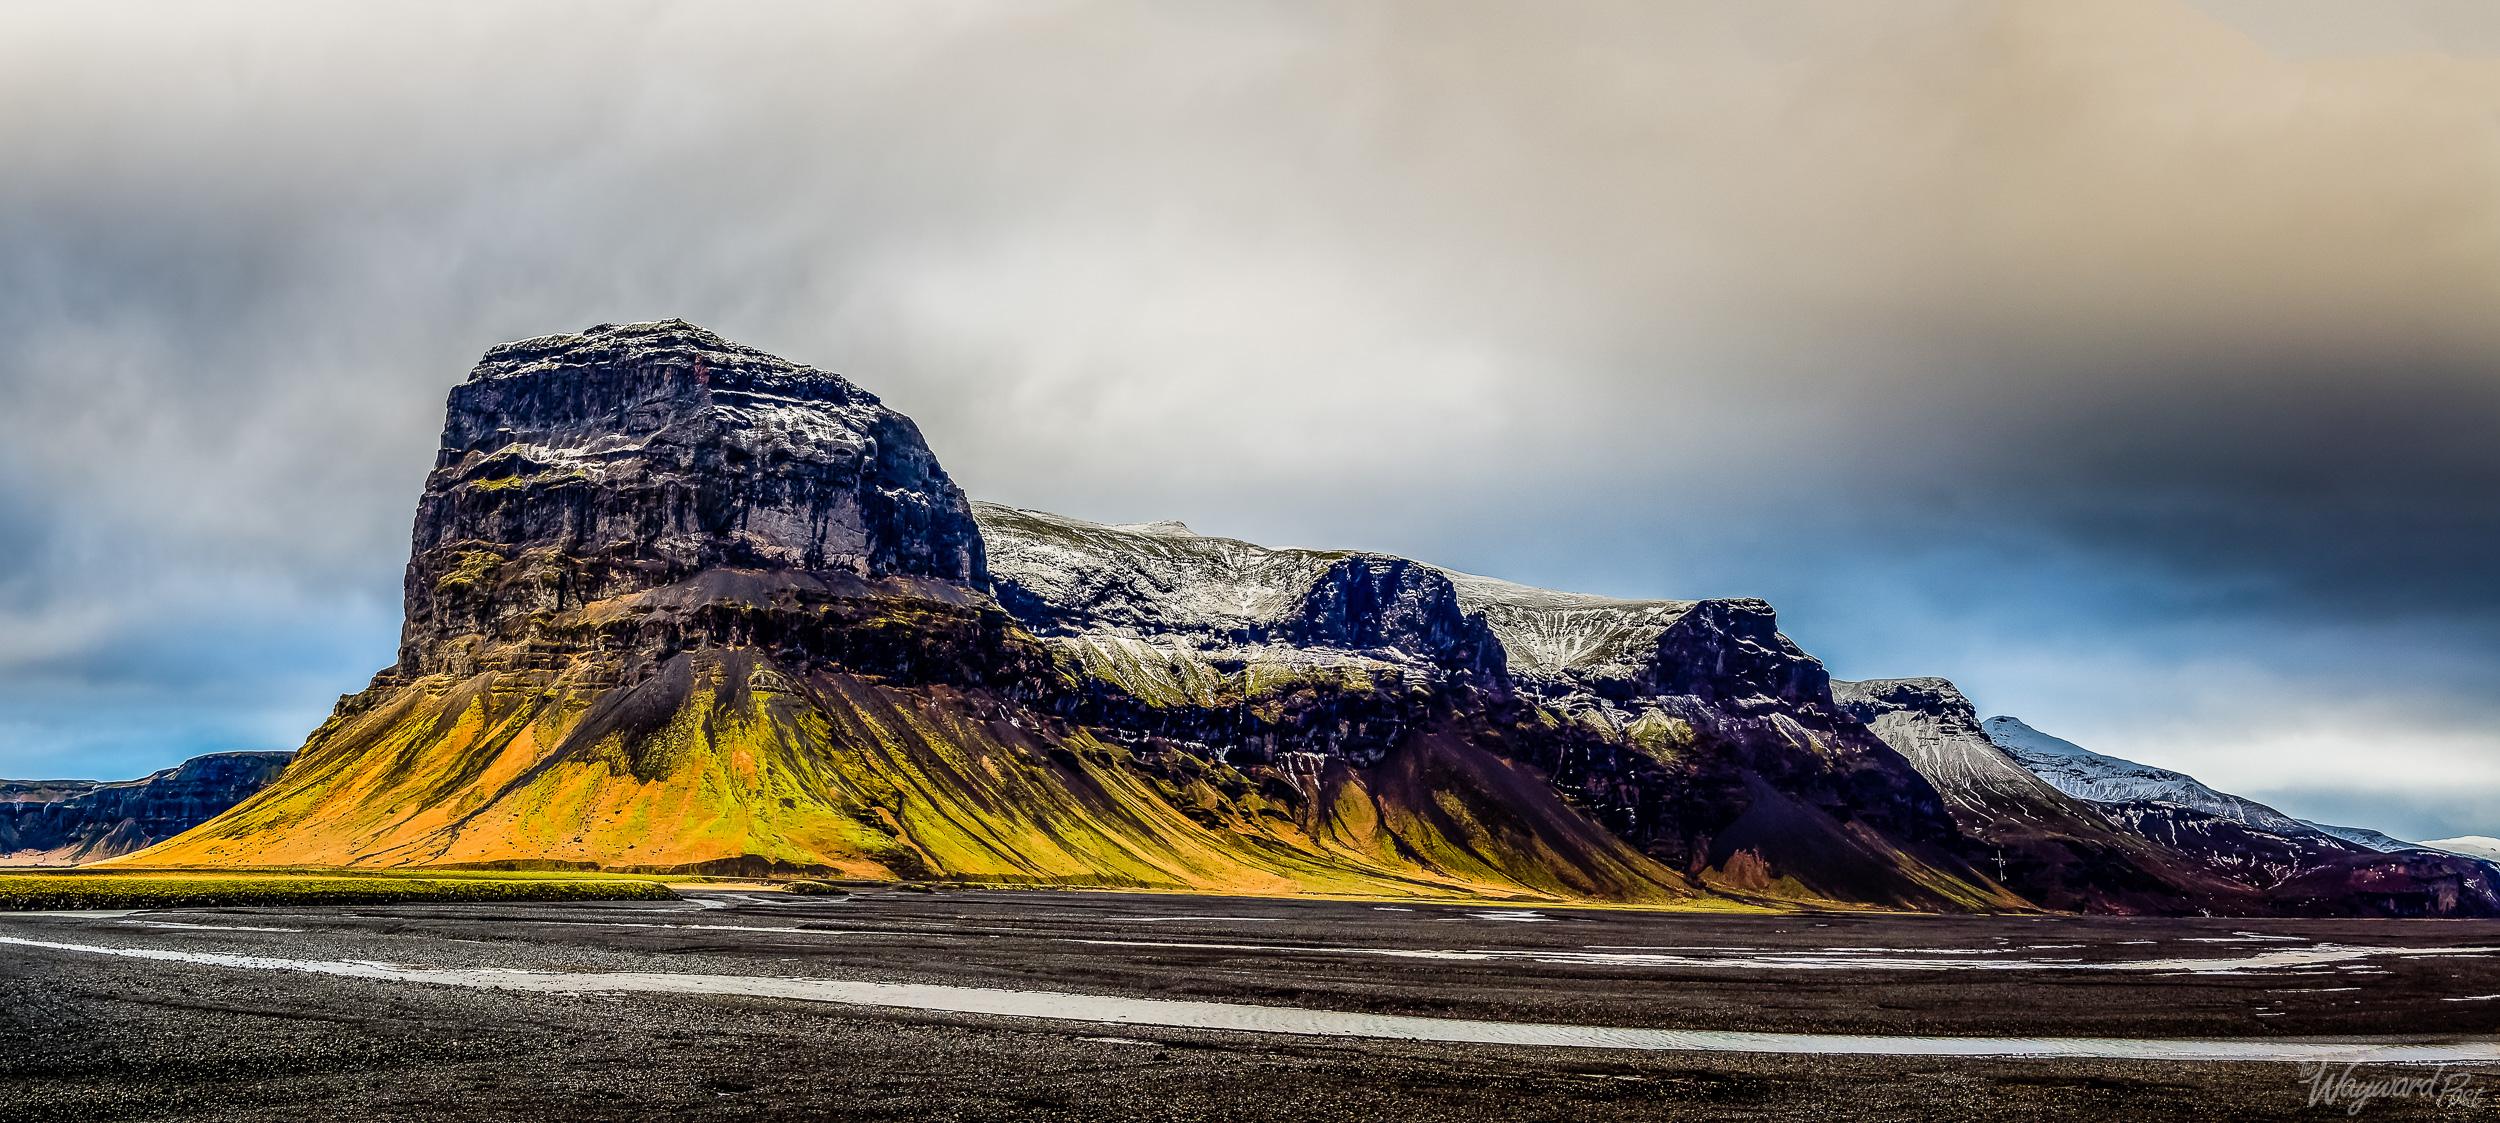 Iceland, Mountains, Snow, Hills, Landscape, The Wayward Post